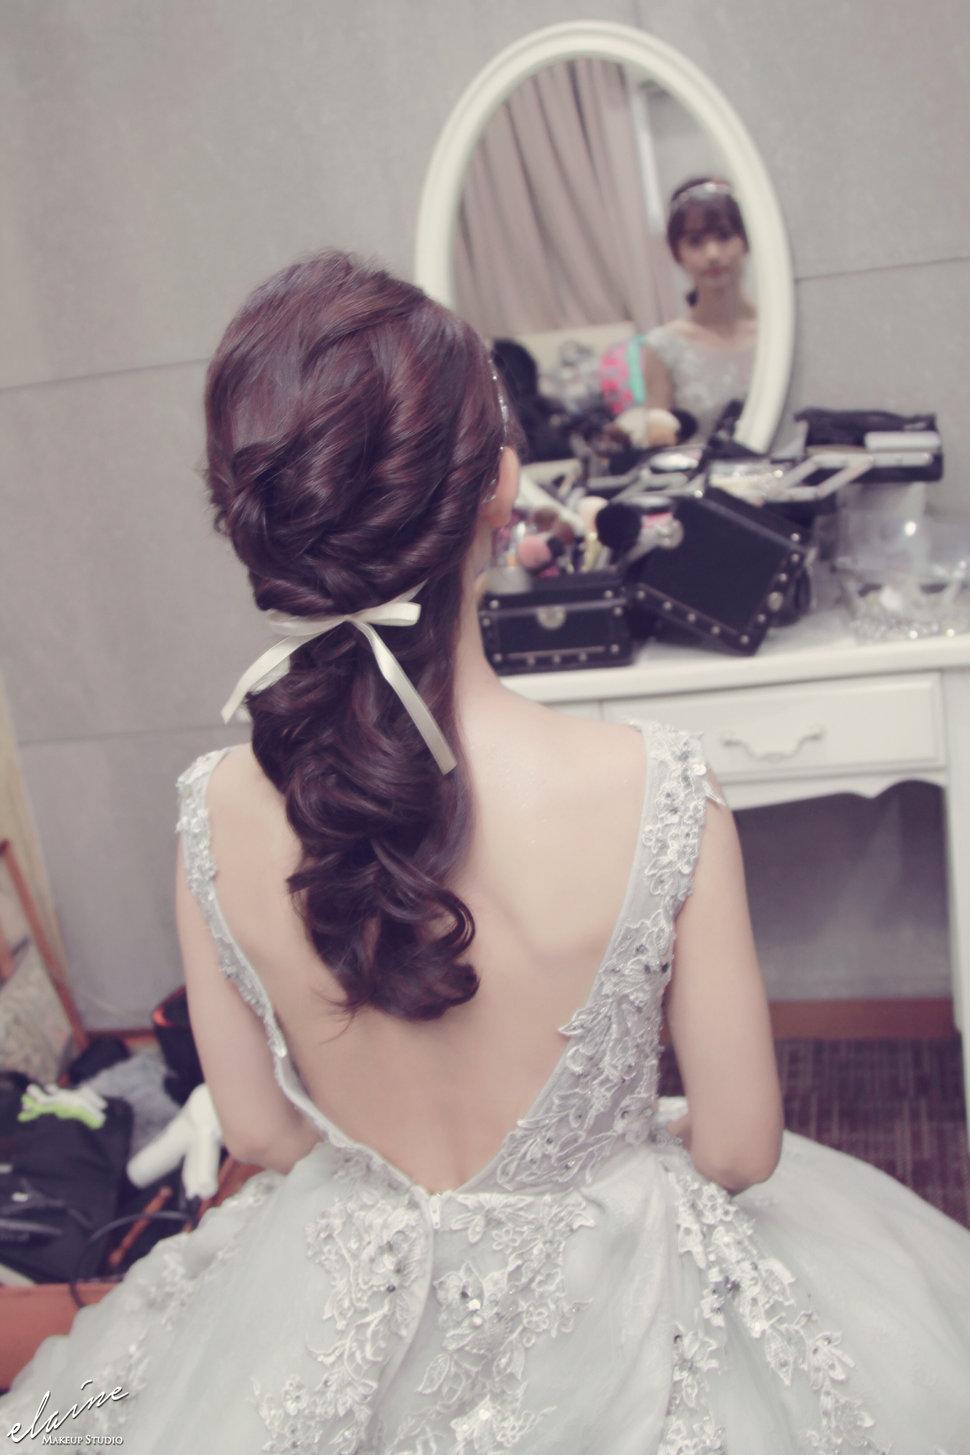 33460924522_3be5d516b6_o - Elaine Sun 彩妝藝術工作室《結婚吧》